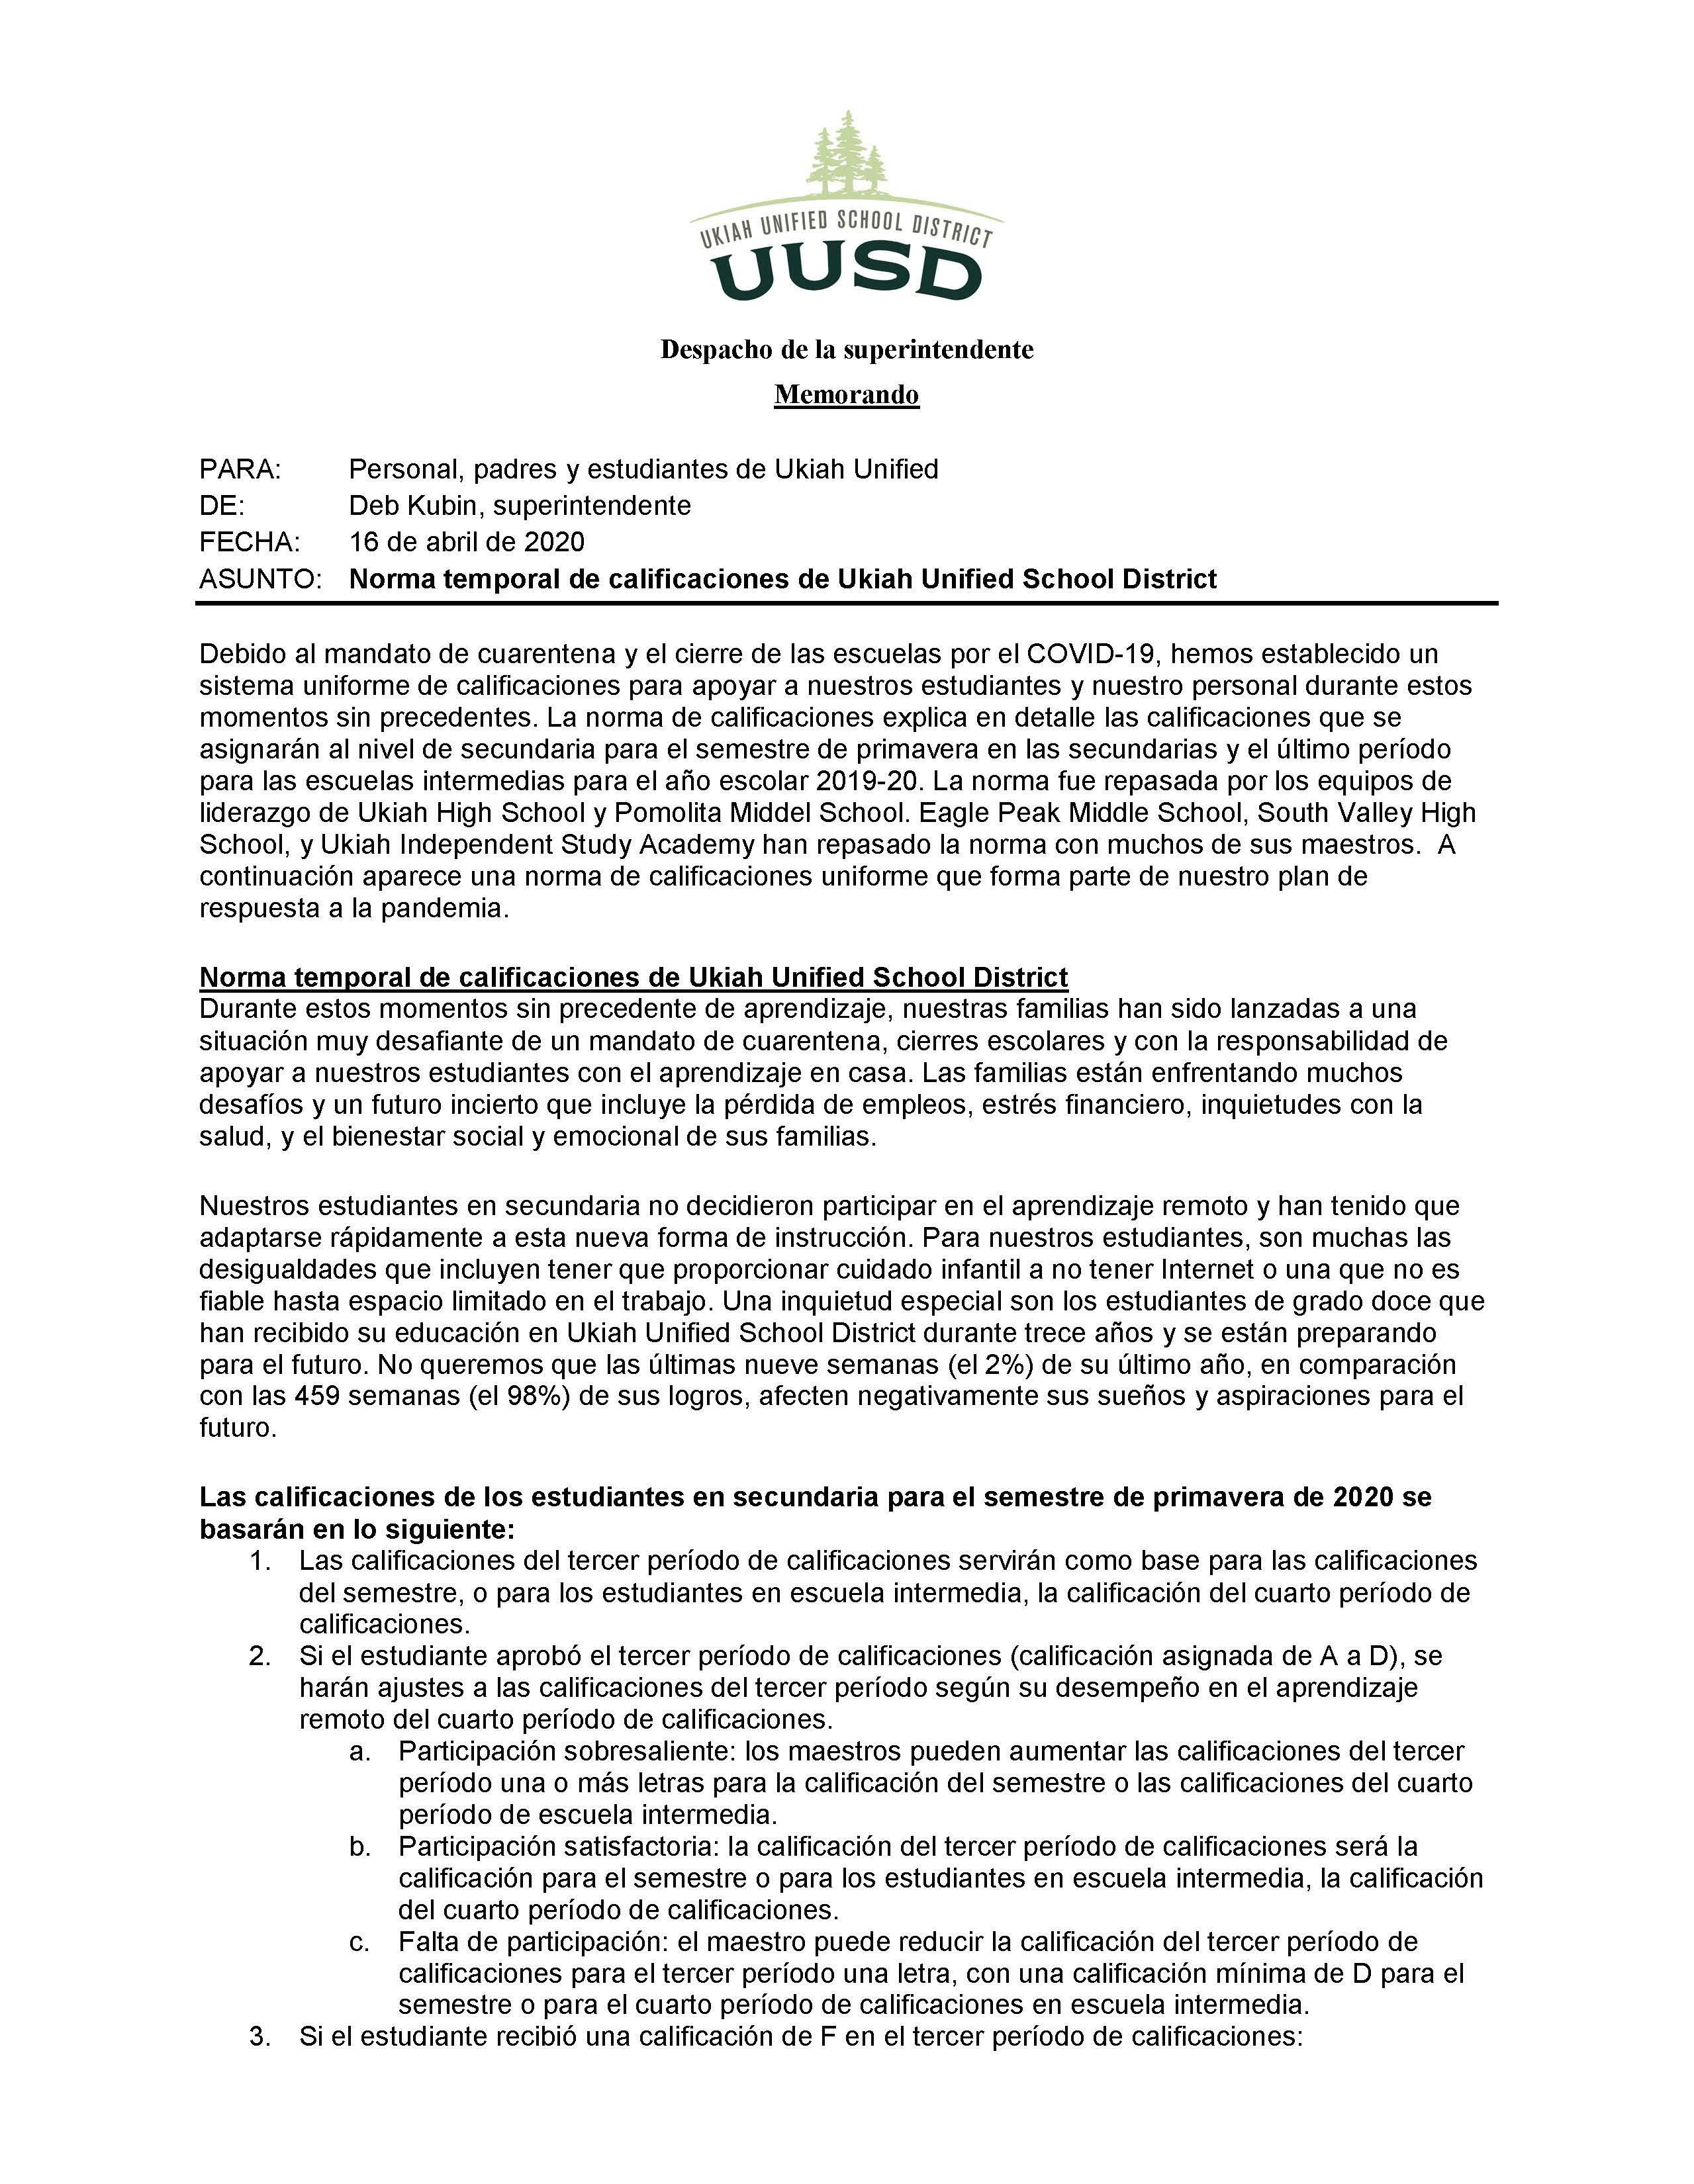 Temporary Grading Policy Spanish